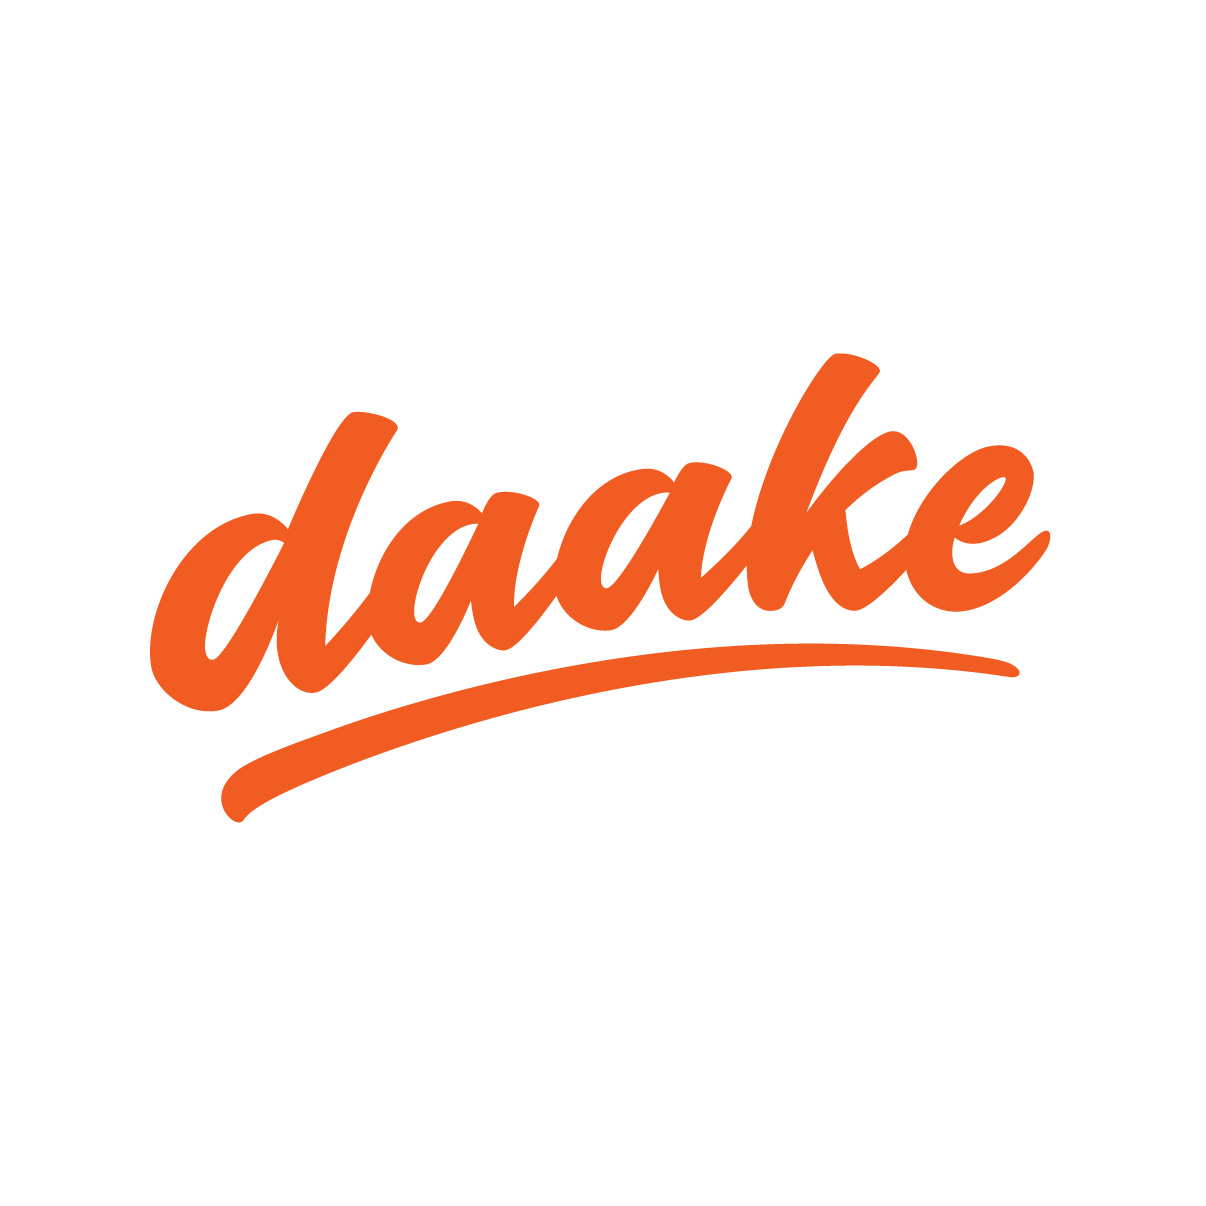 DAAKE Design, Inc on LogoLounge